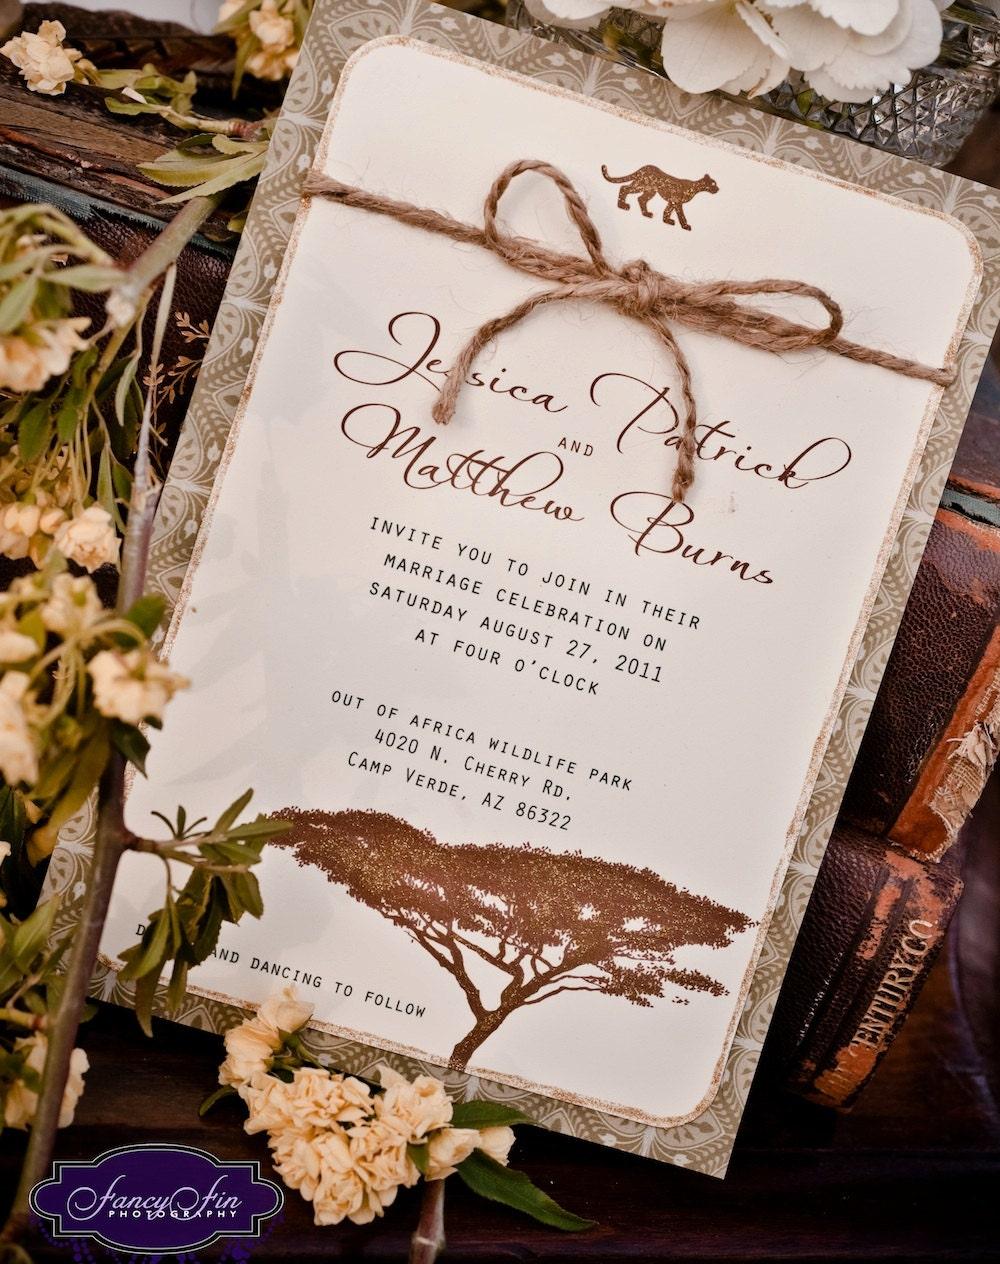 vintage desert safari wedding invitations hand by festivefetti. Black Bedroom Furniture Sets. Home Design Ideas